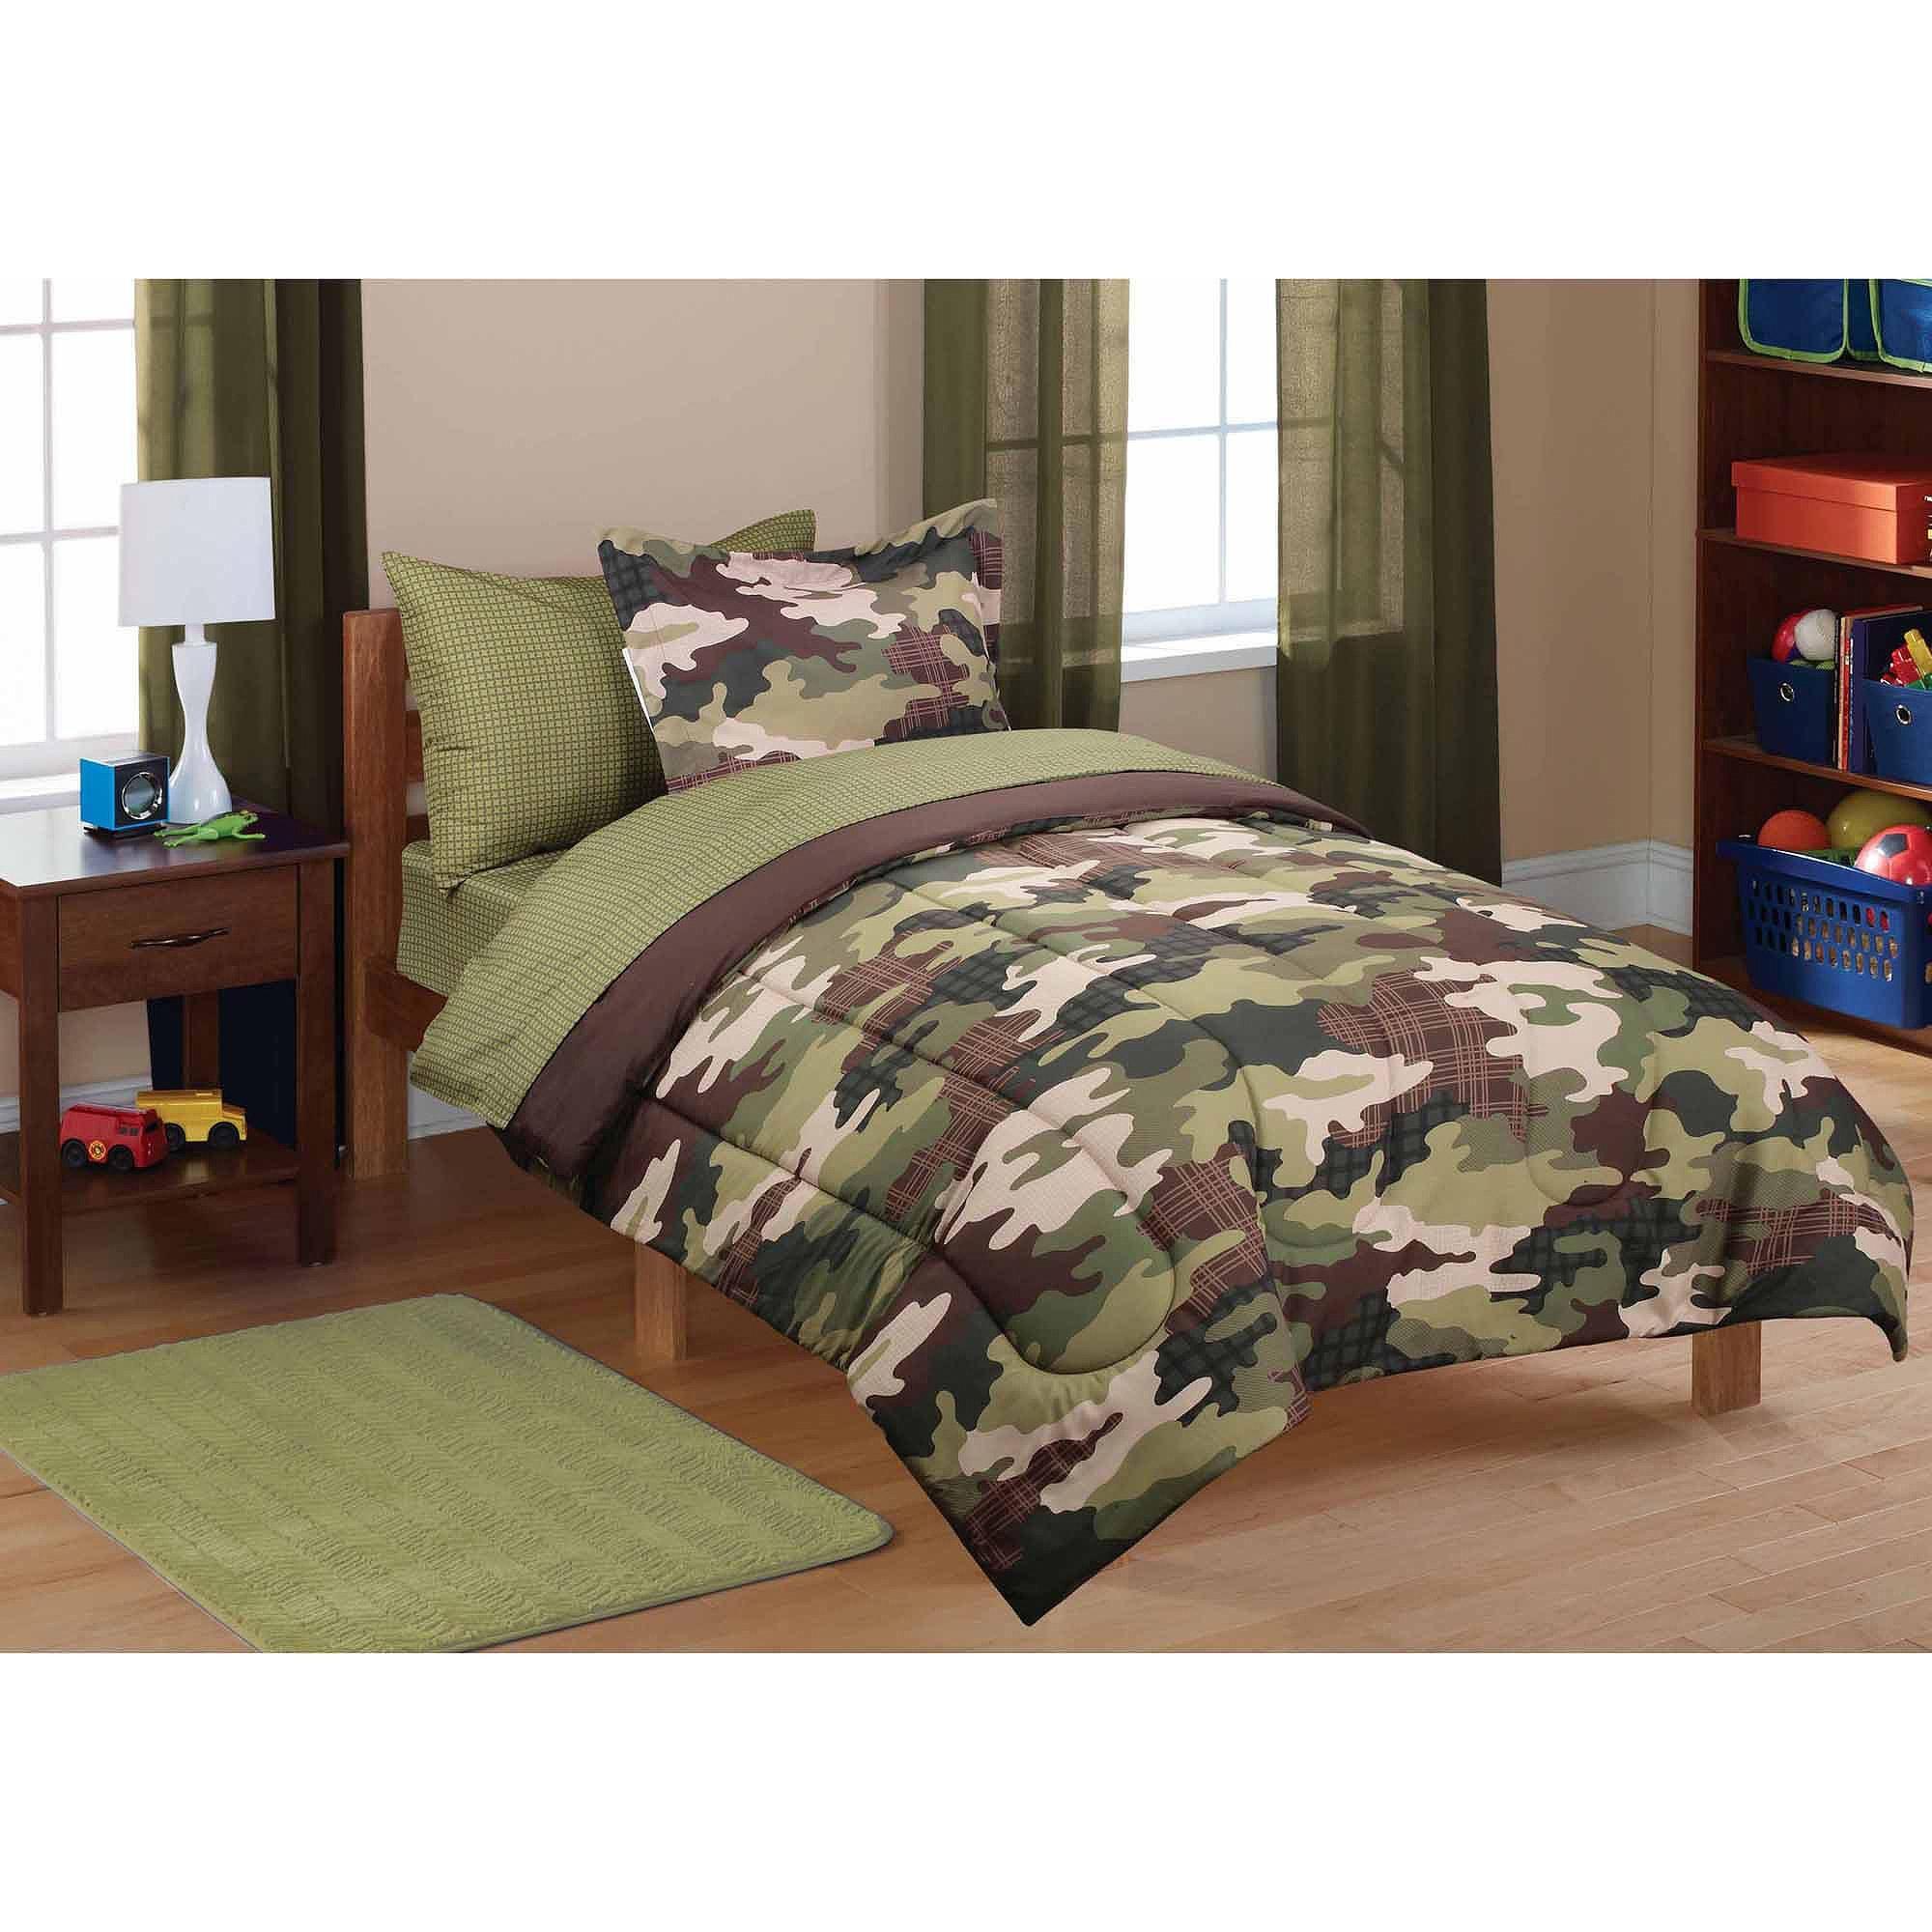 New Boy/'s Twin Size Comforter Set Camo Camouflage Bedding Comforters Sham Kid/'s